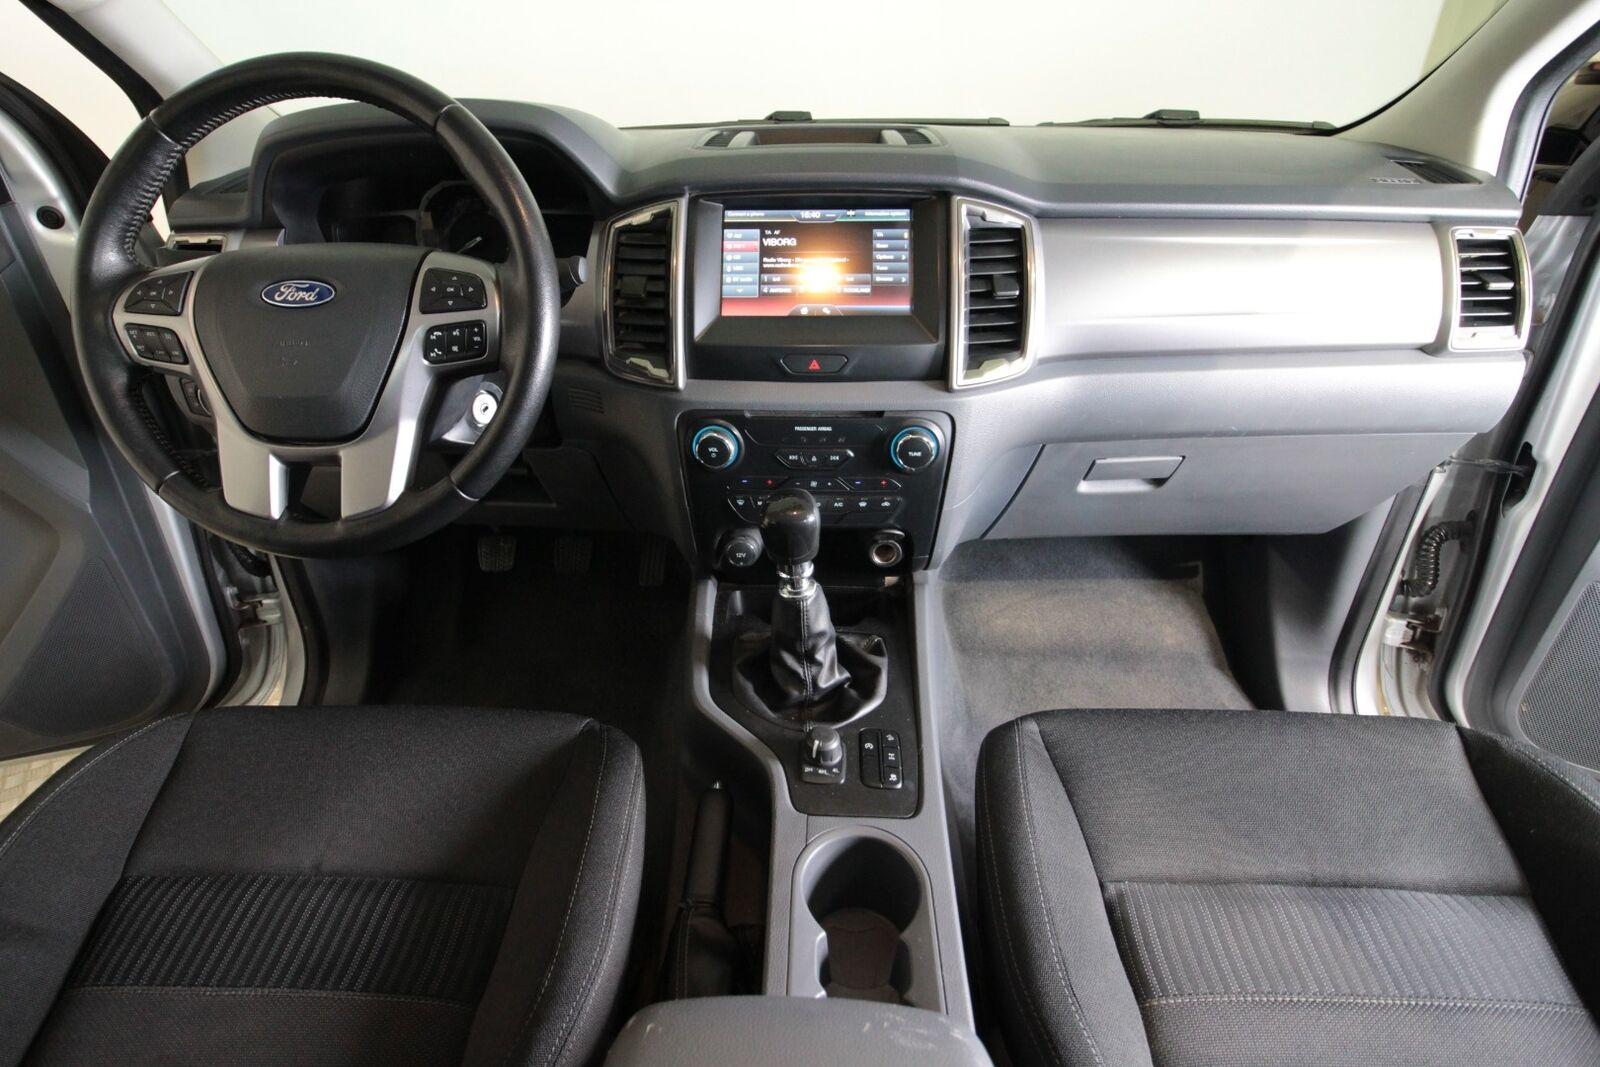 Ford Ranger TDCi 160 Db.Cab XL 4x4